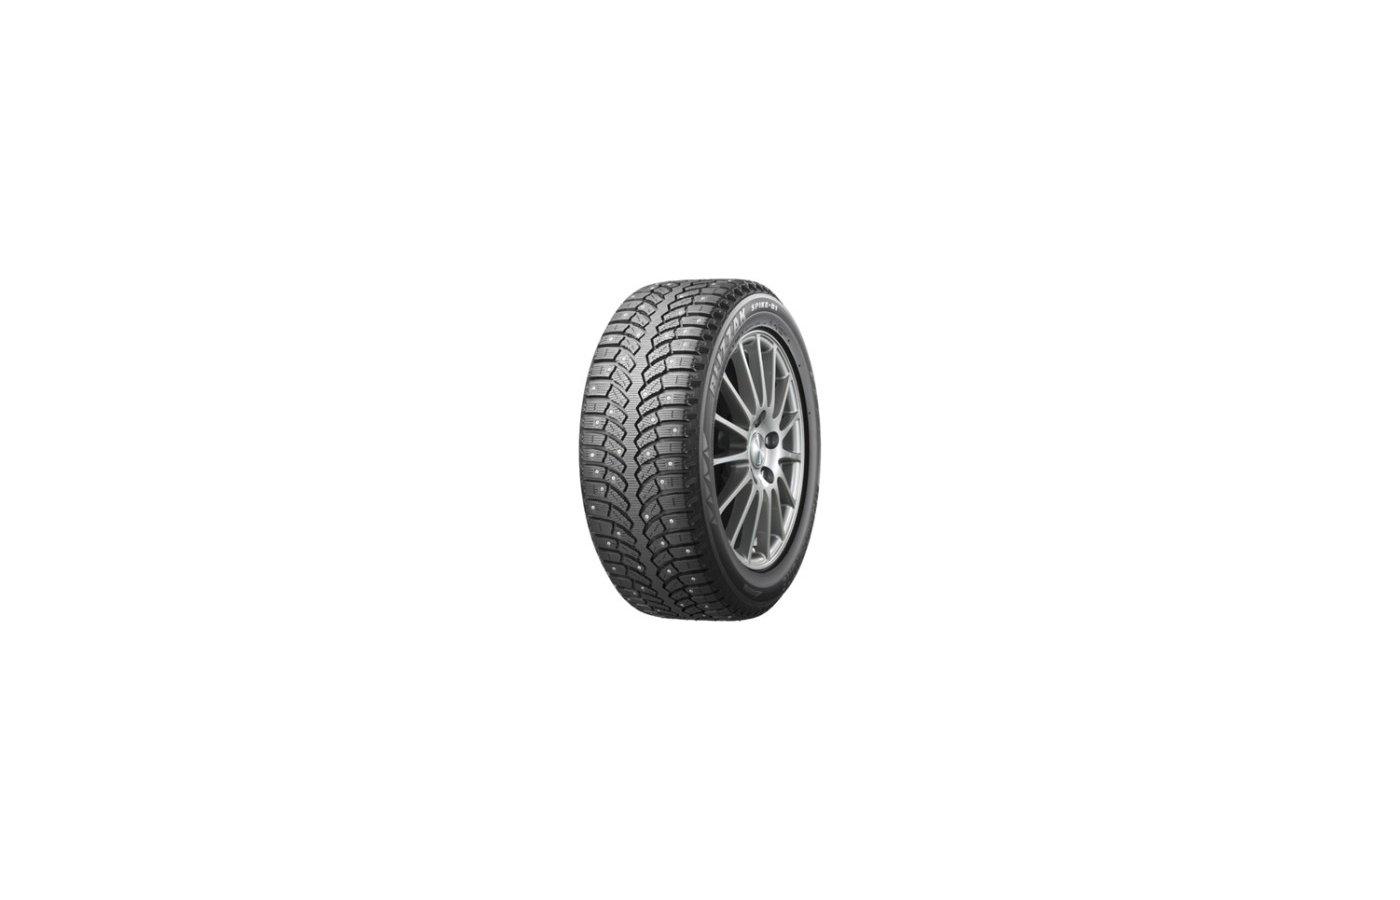 Шина Bridgestone Blizzak Spike-01 185/55 R15 TL 82T шип